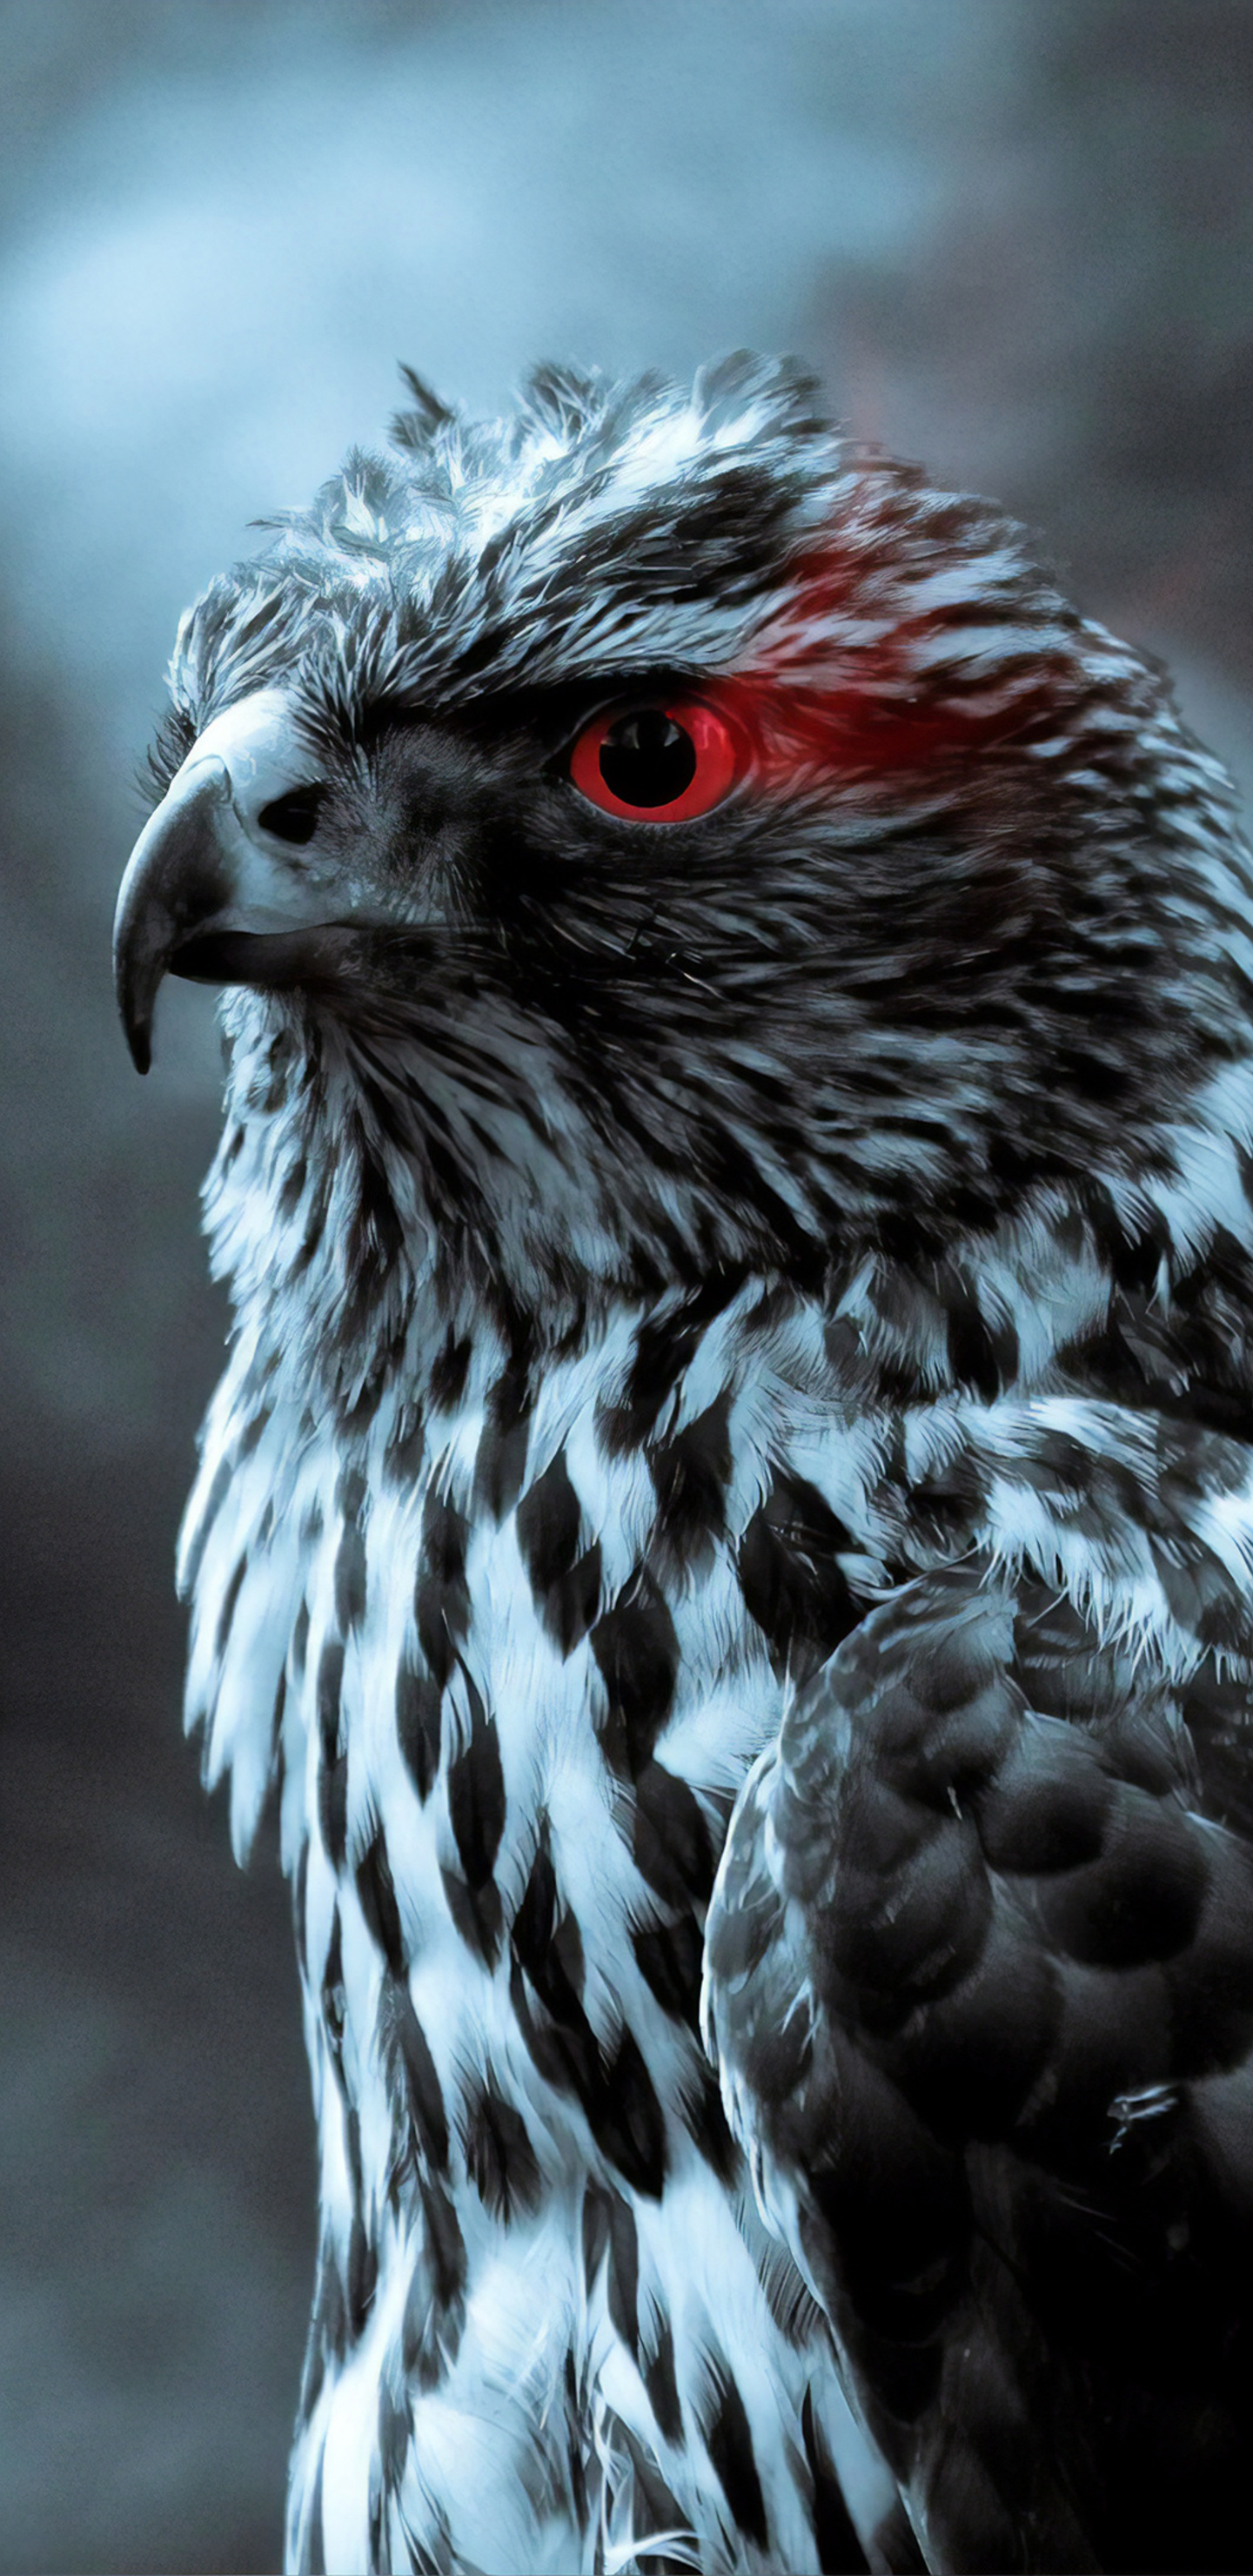 red-eye-eagle-4k-48.jpg